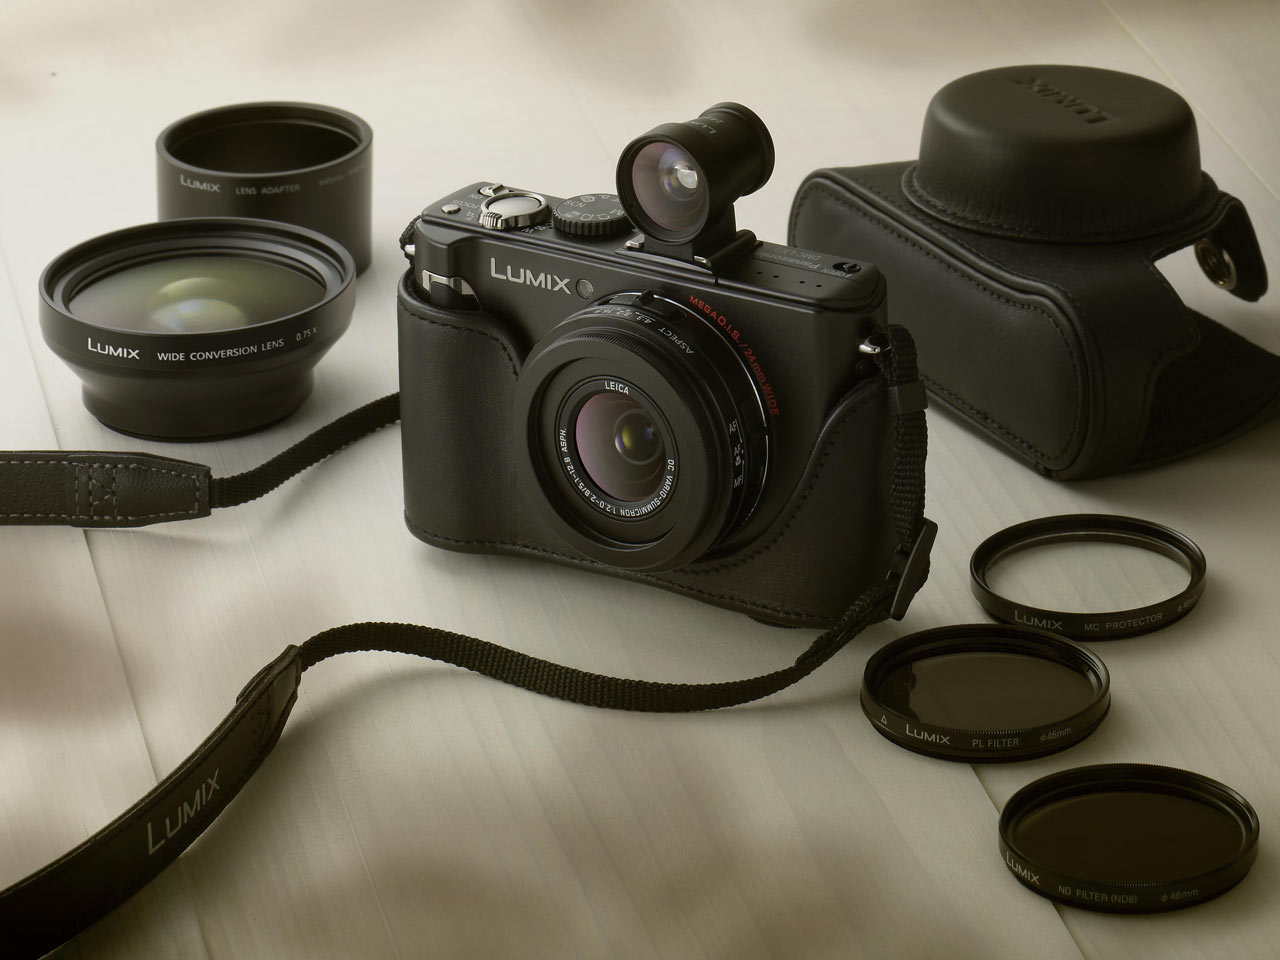 panasonic lumix dmc lx3 digital photography review rh dpreview com Panasonic LX2 panasonic lx3 user manual